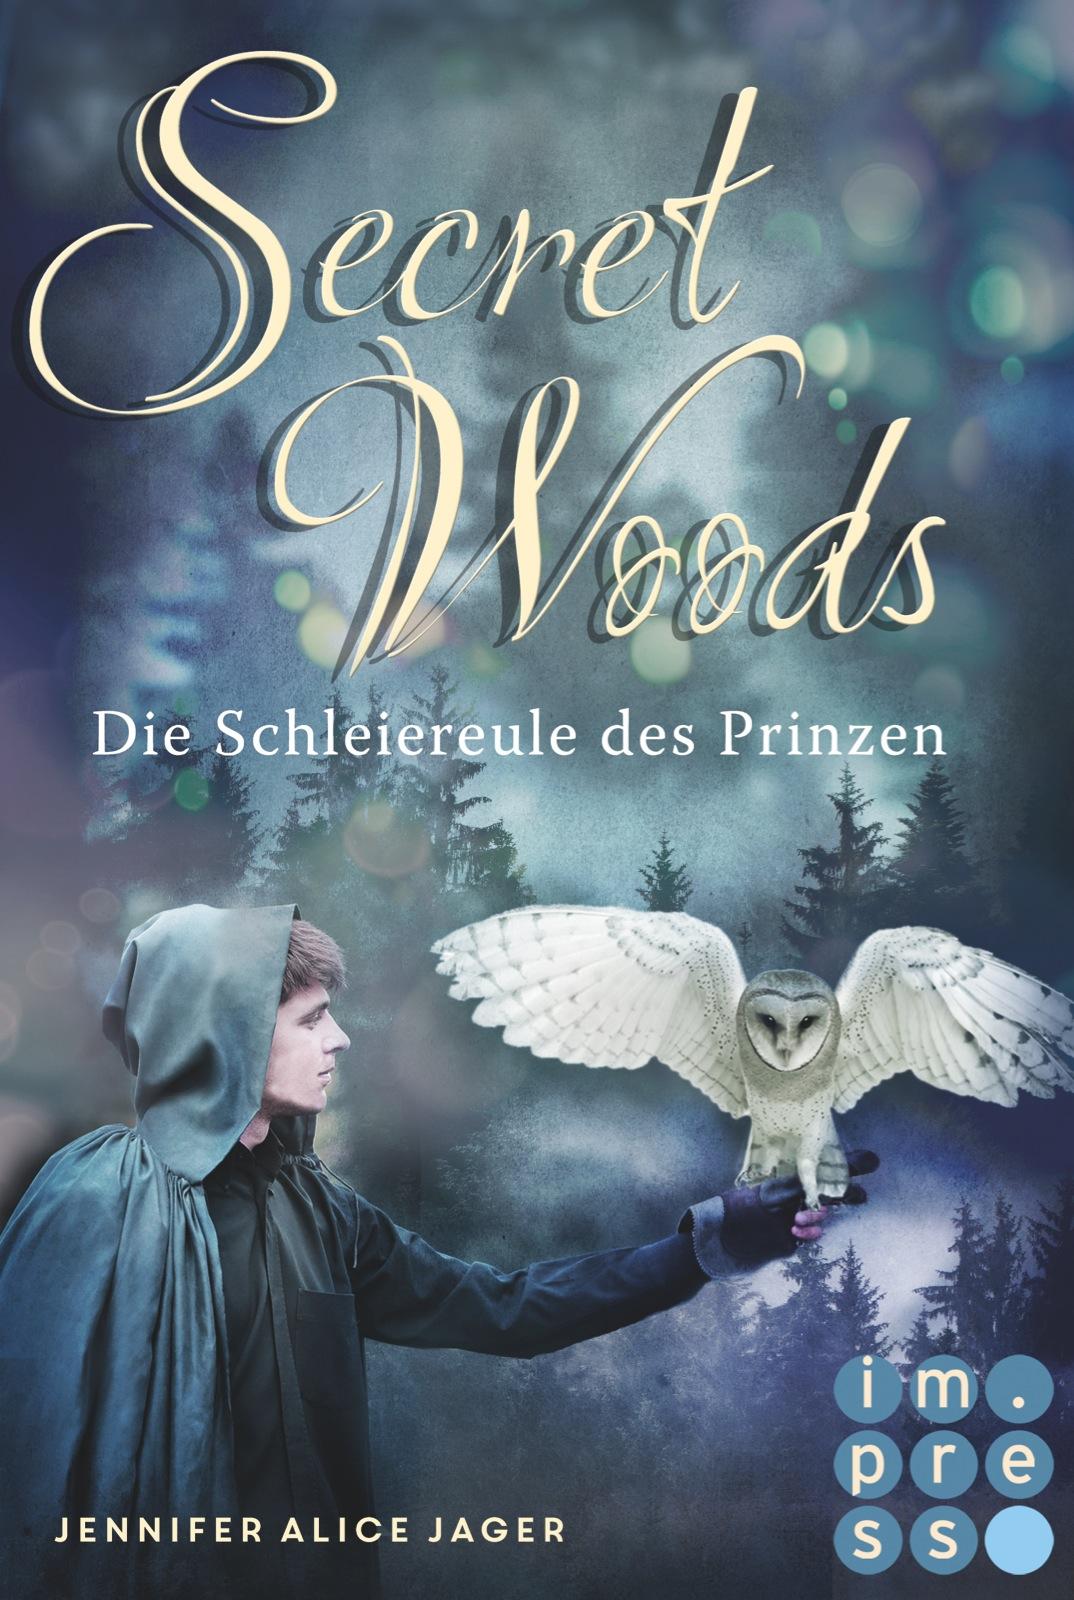 Jager, Jennifer Alice: Secret Woods - Die Schleiereule des Prinzen